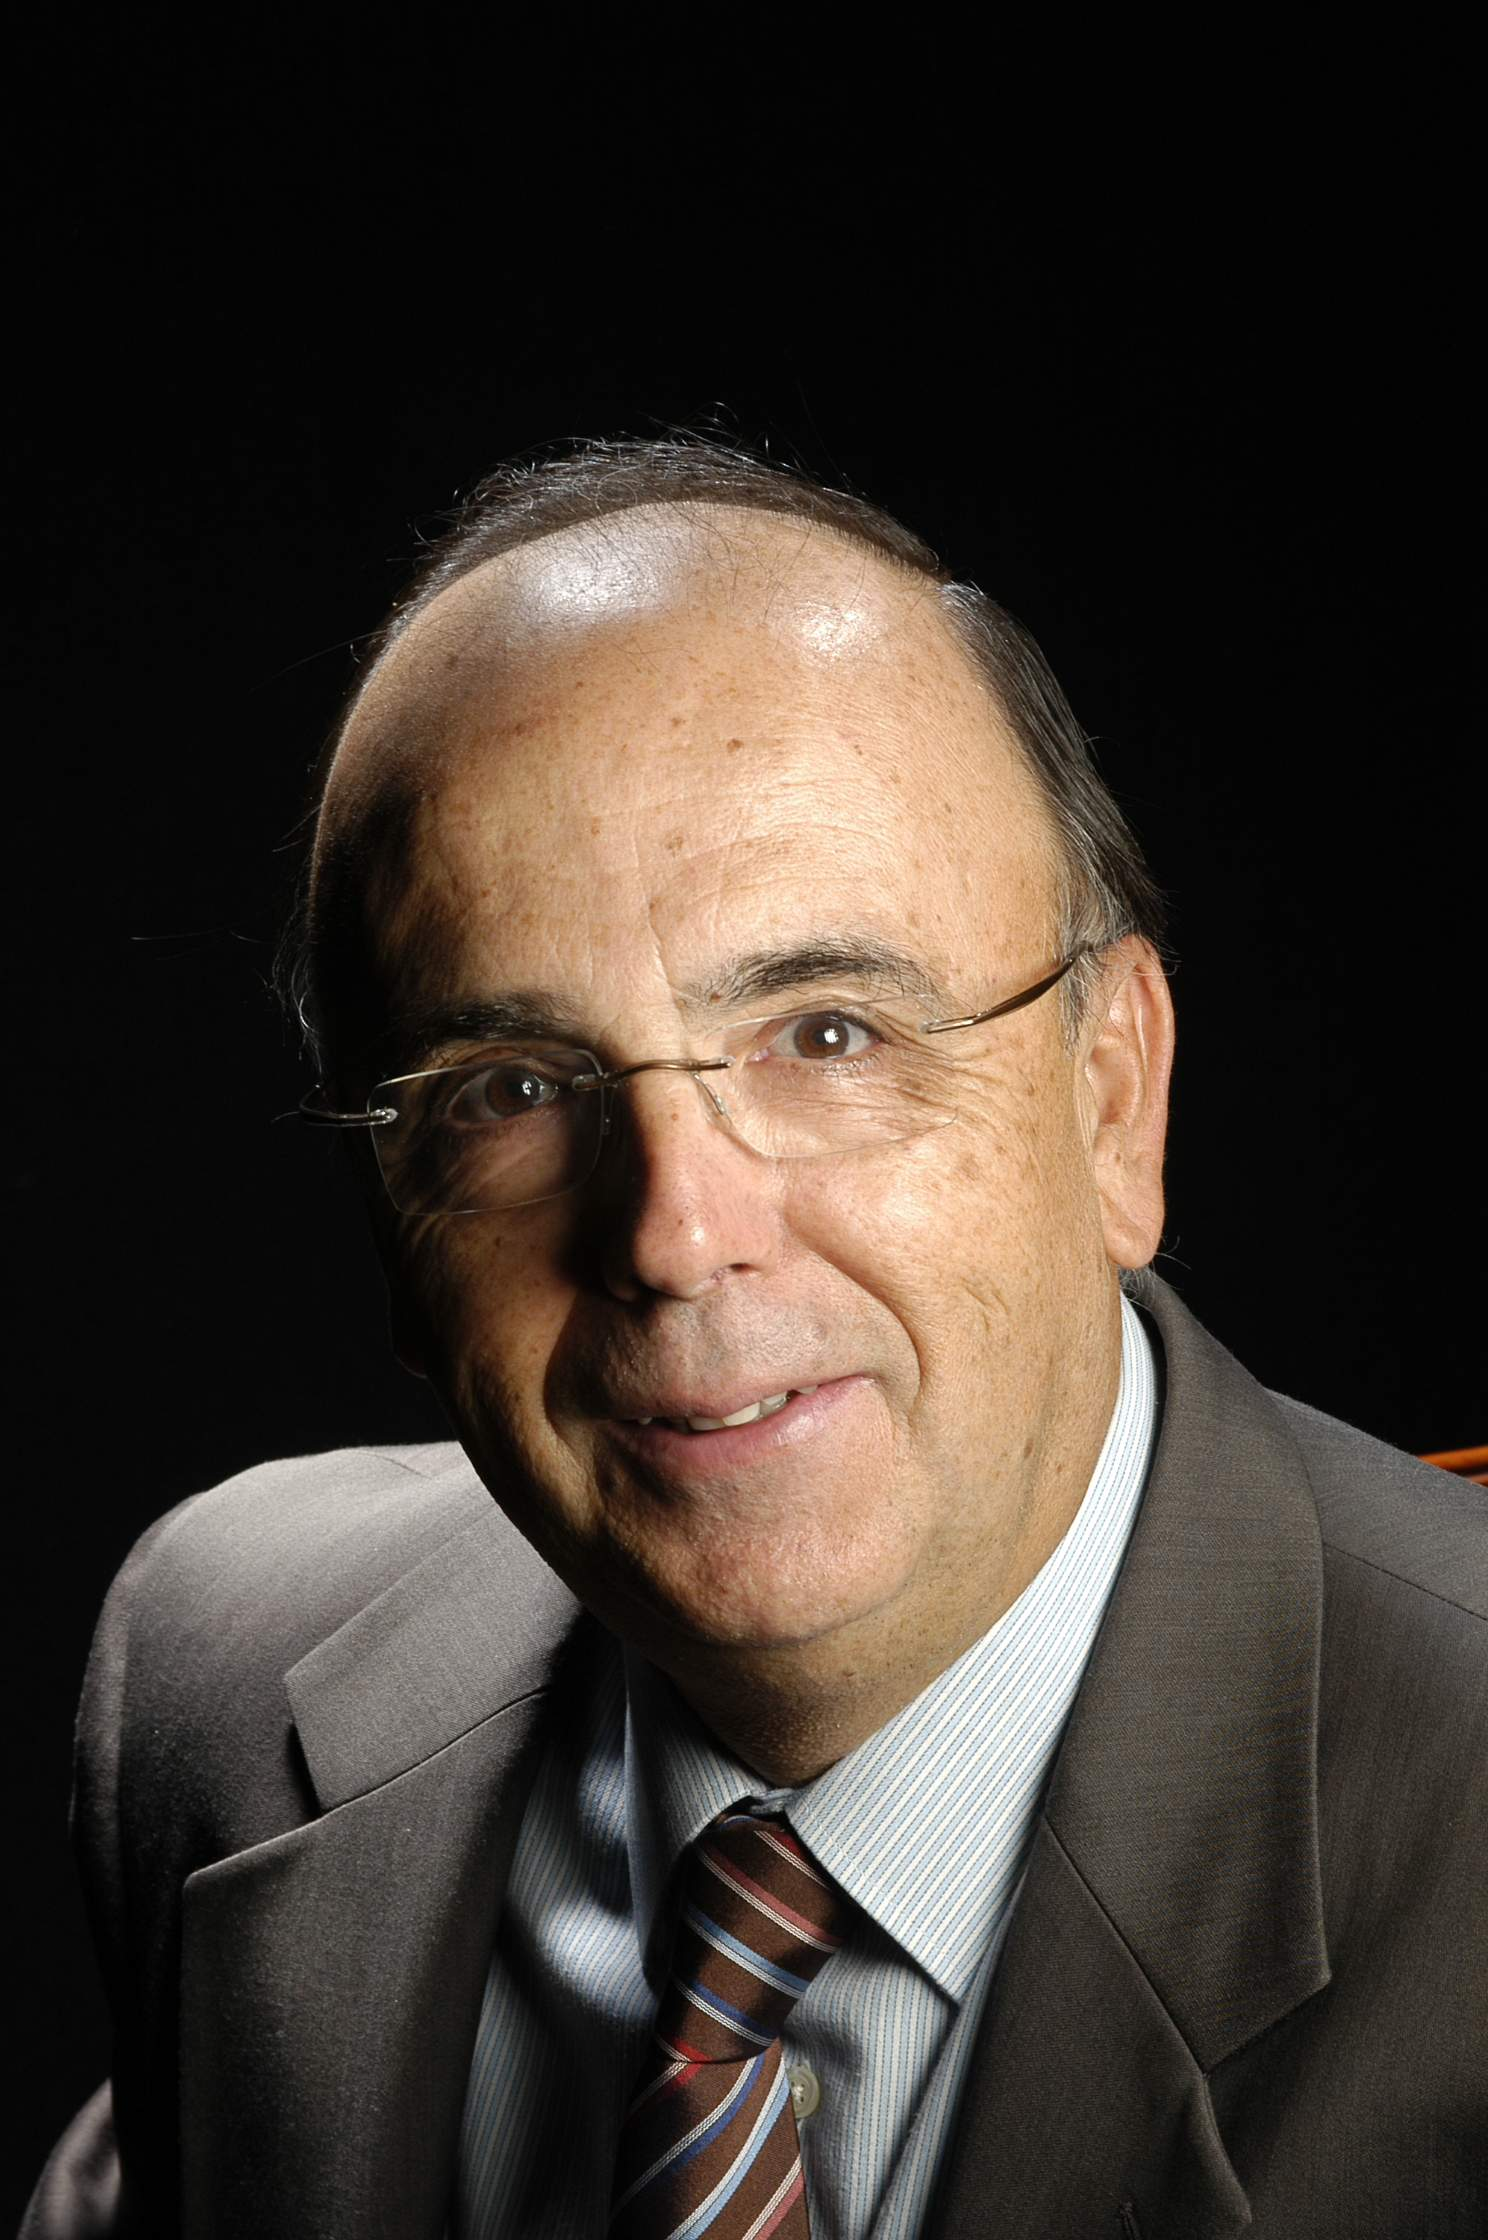 Dr. Josep Lluís Alonso Segura